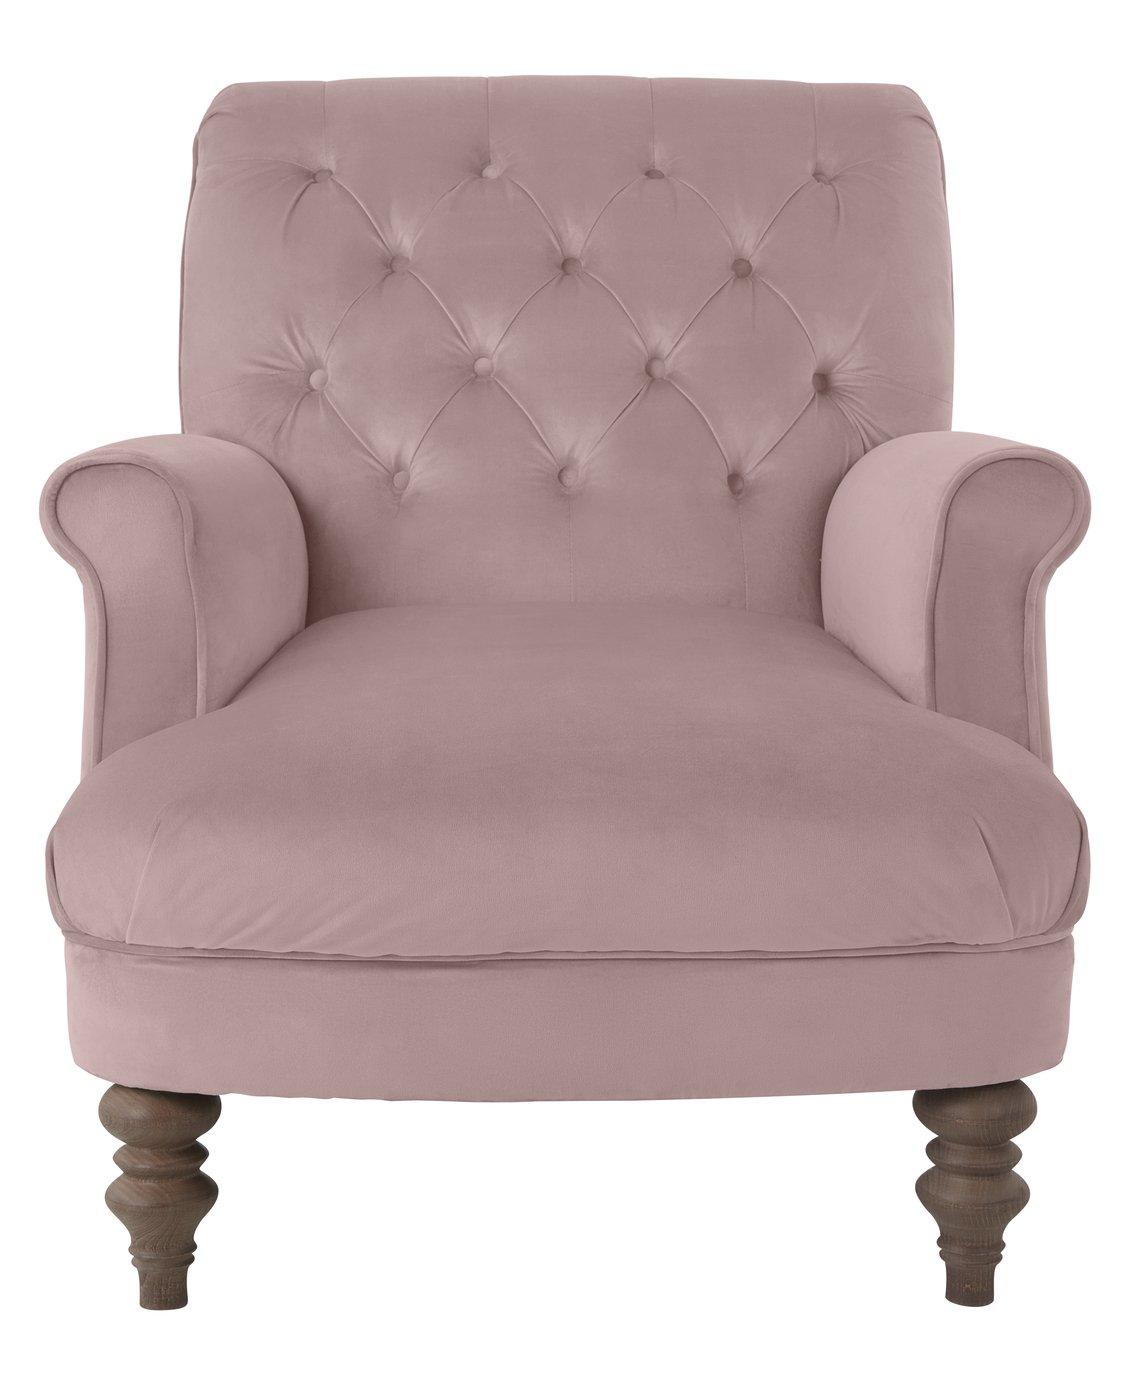 Argos Home Valerie Velvet Accent Chair - Pink